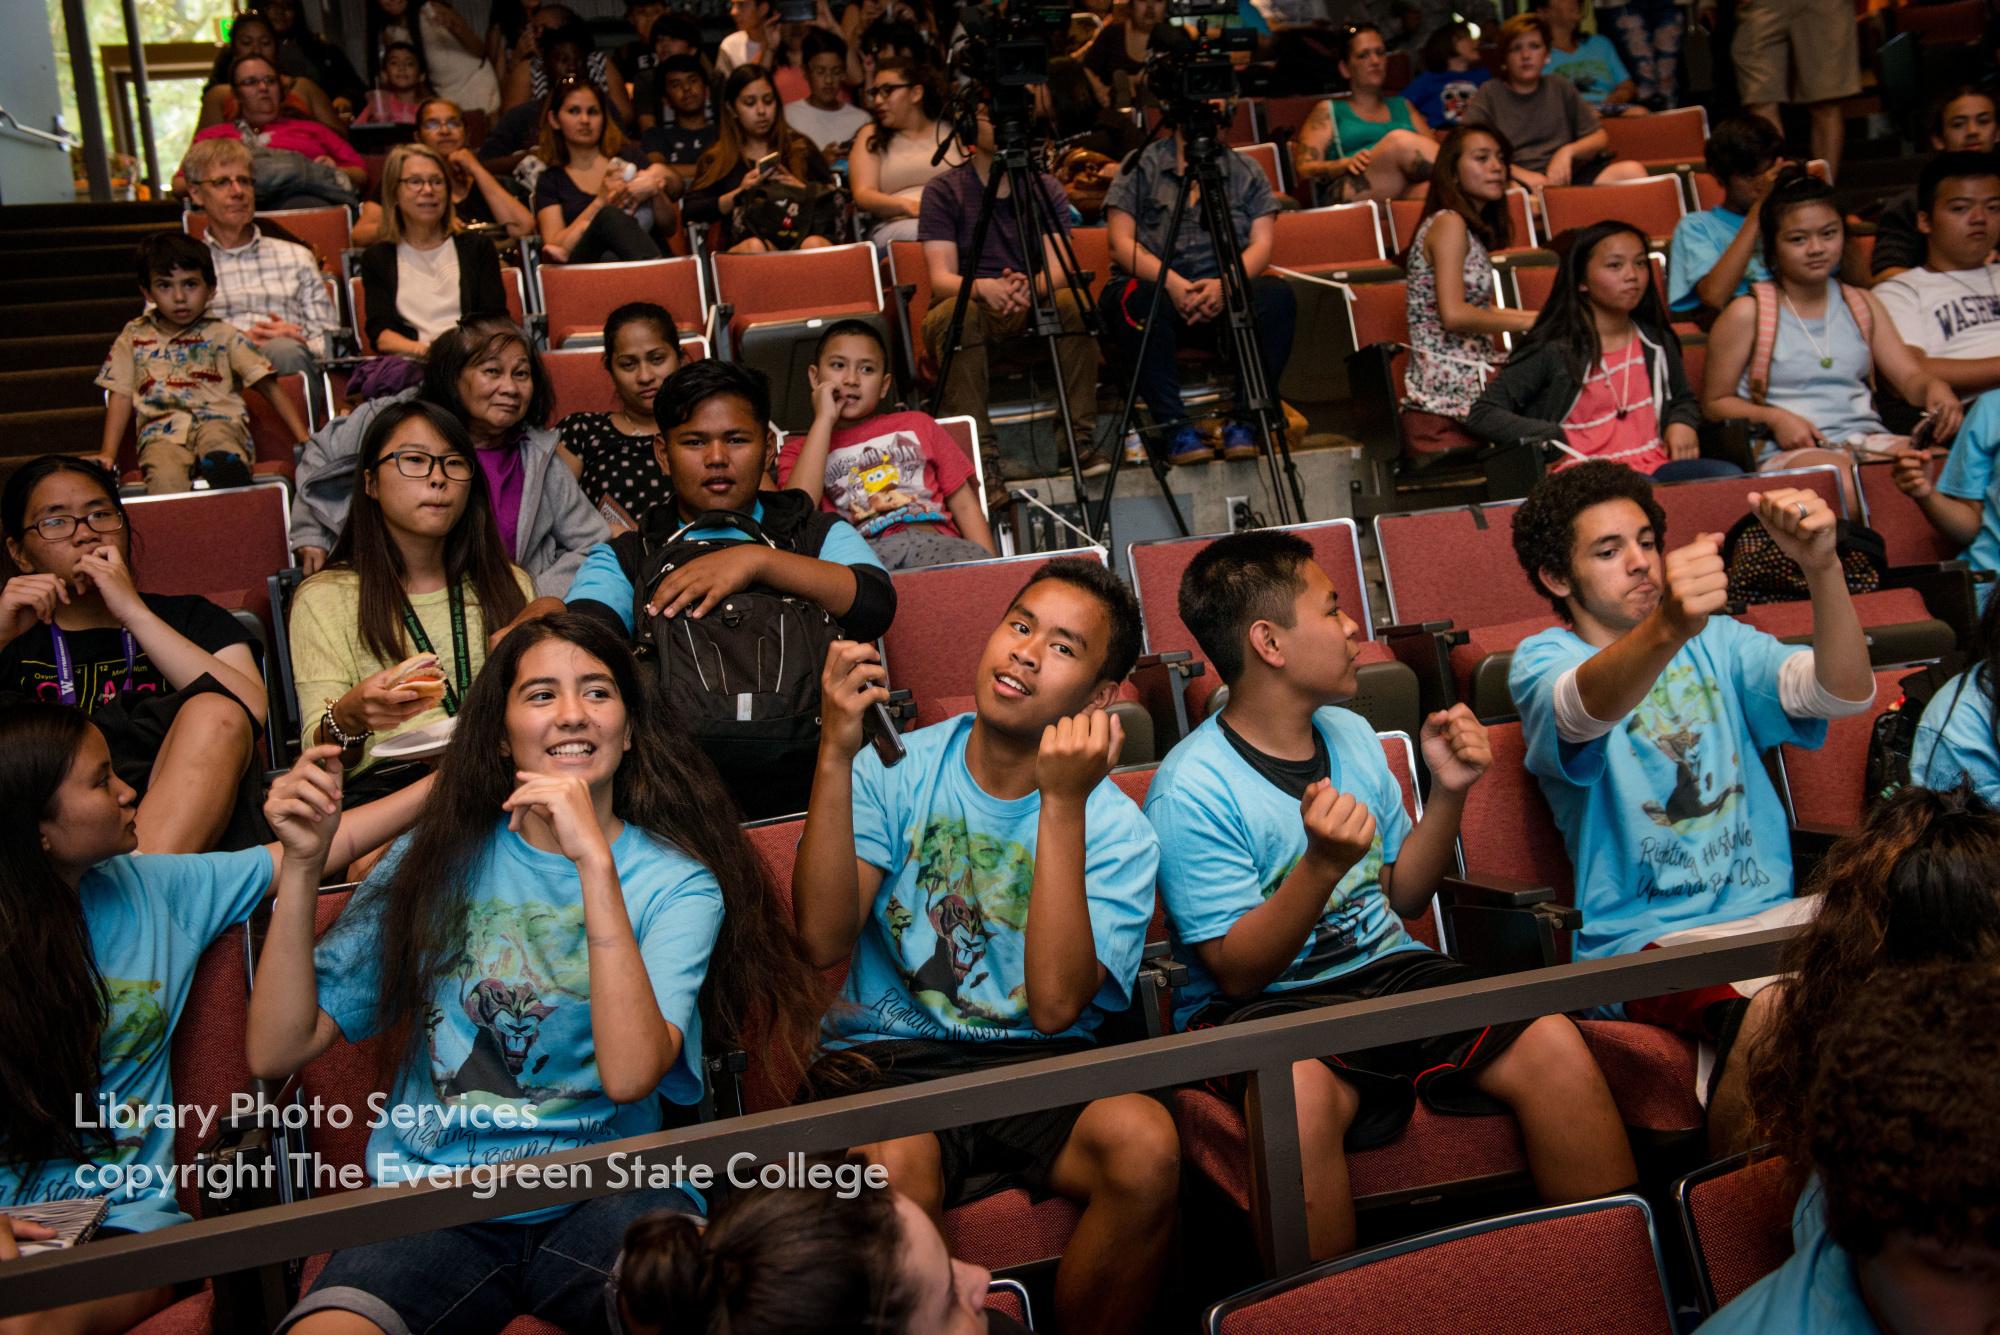 Upward bound students dancing in the auditorium